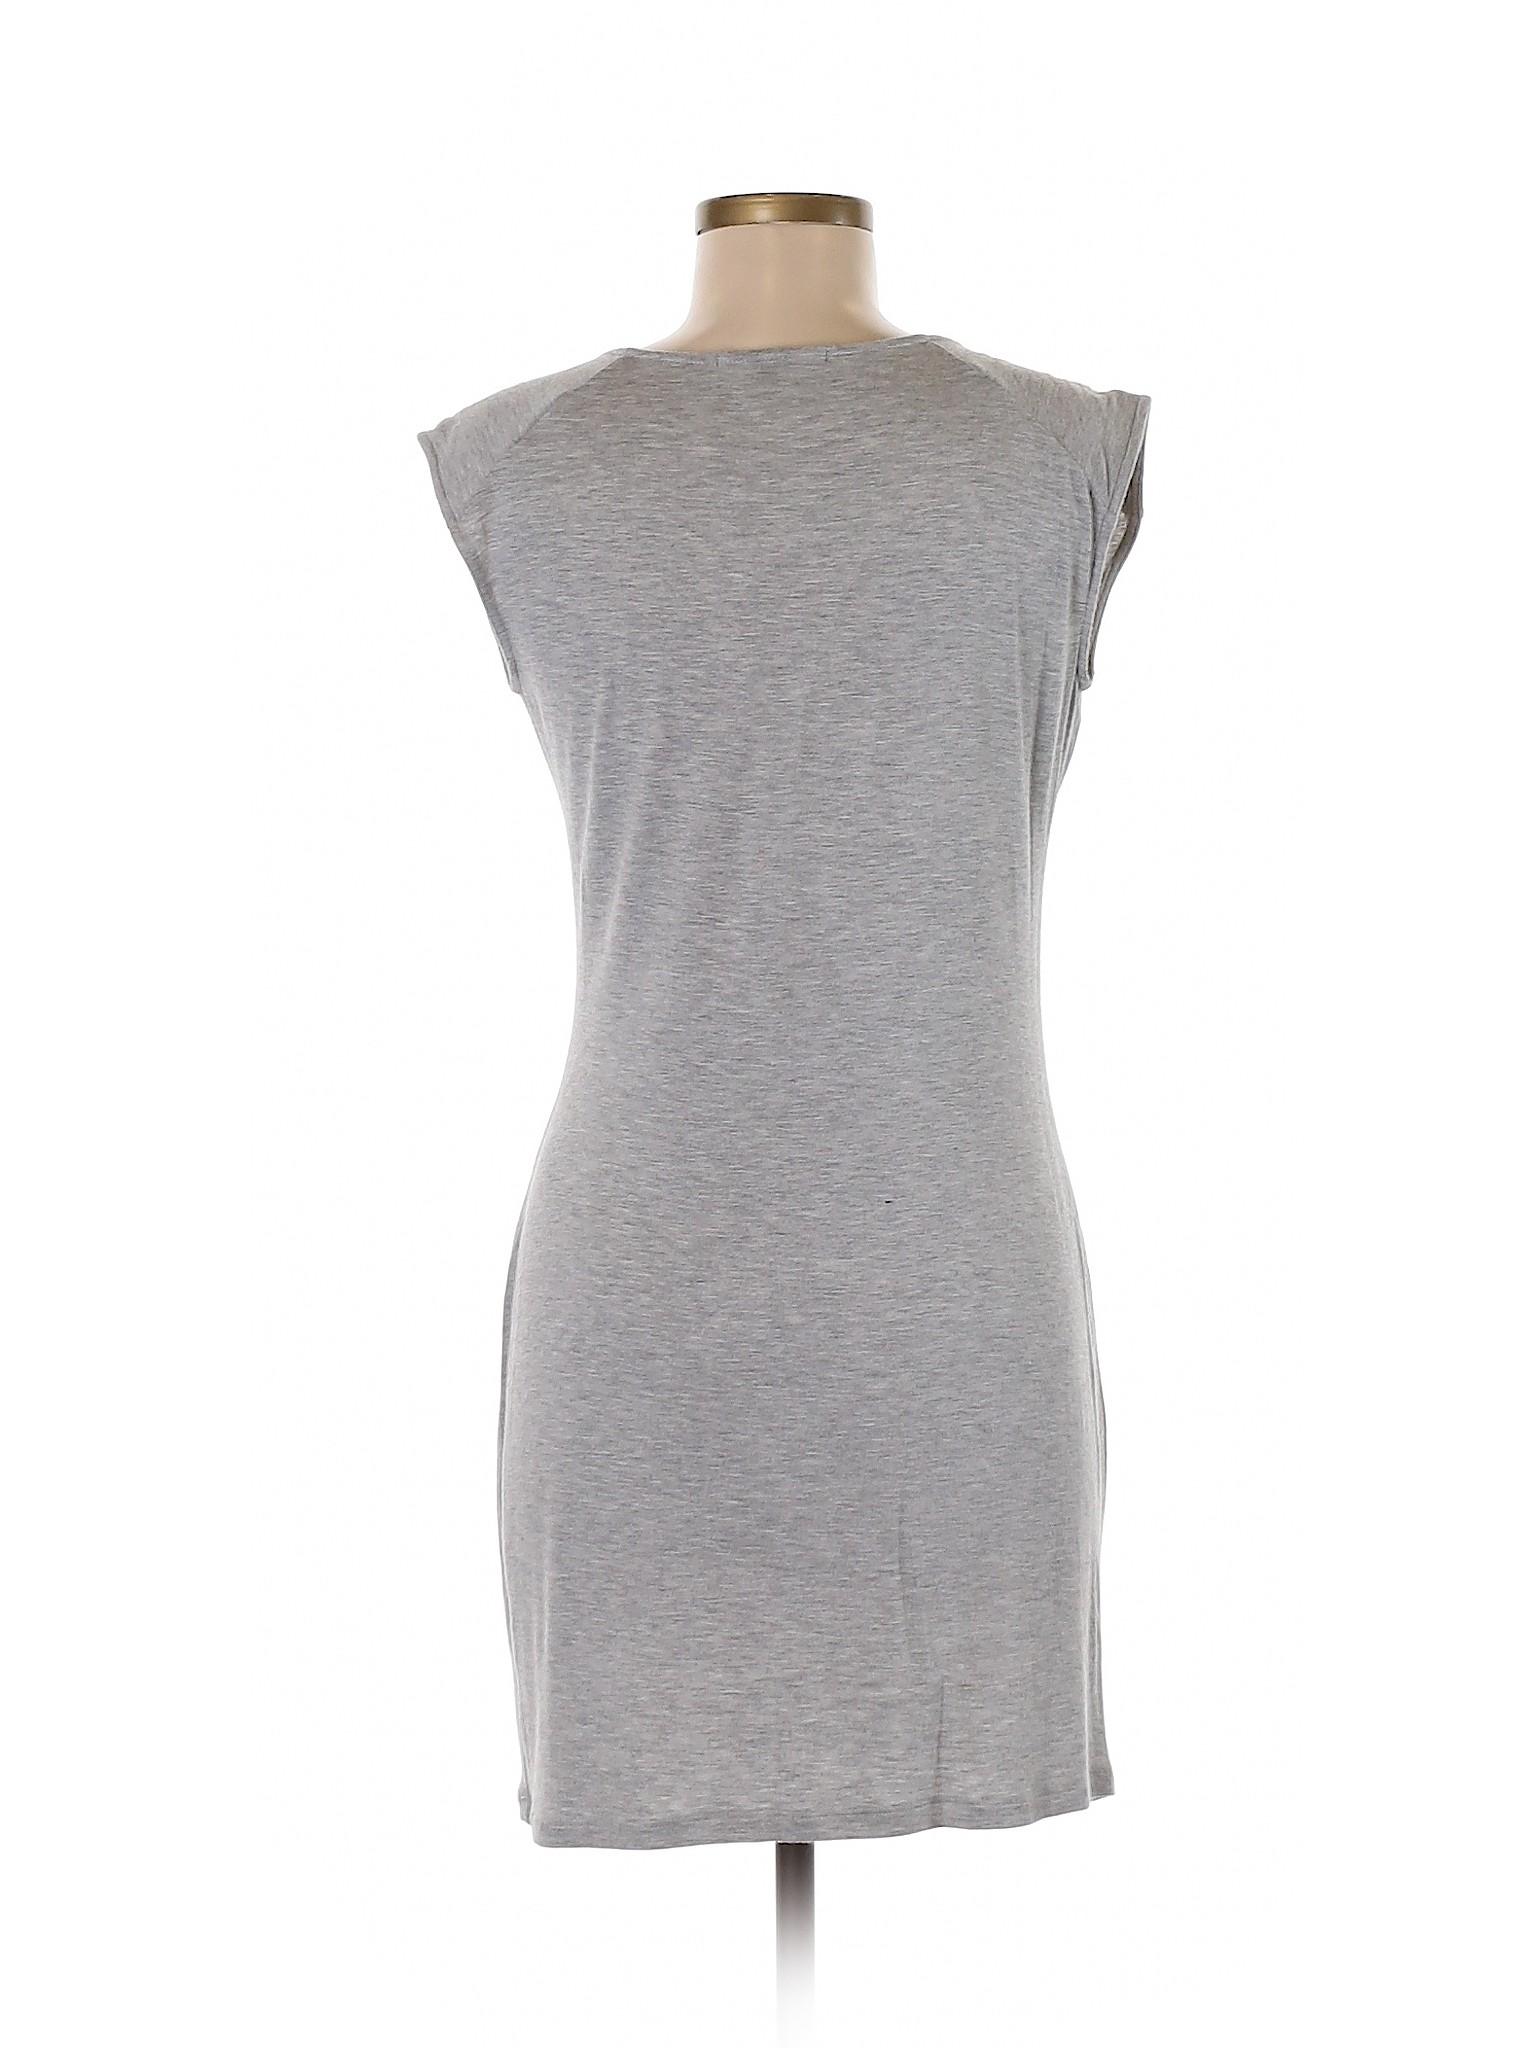 0acc5f332de Blu Heaven Women s Clothing On Sale Up To 90% Off Retail